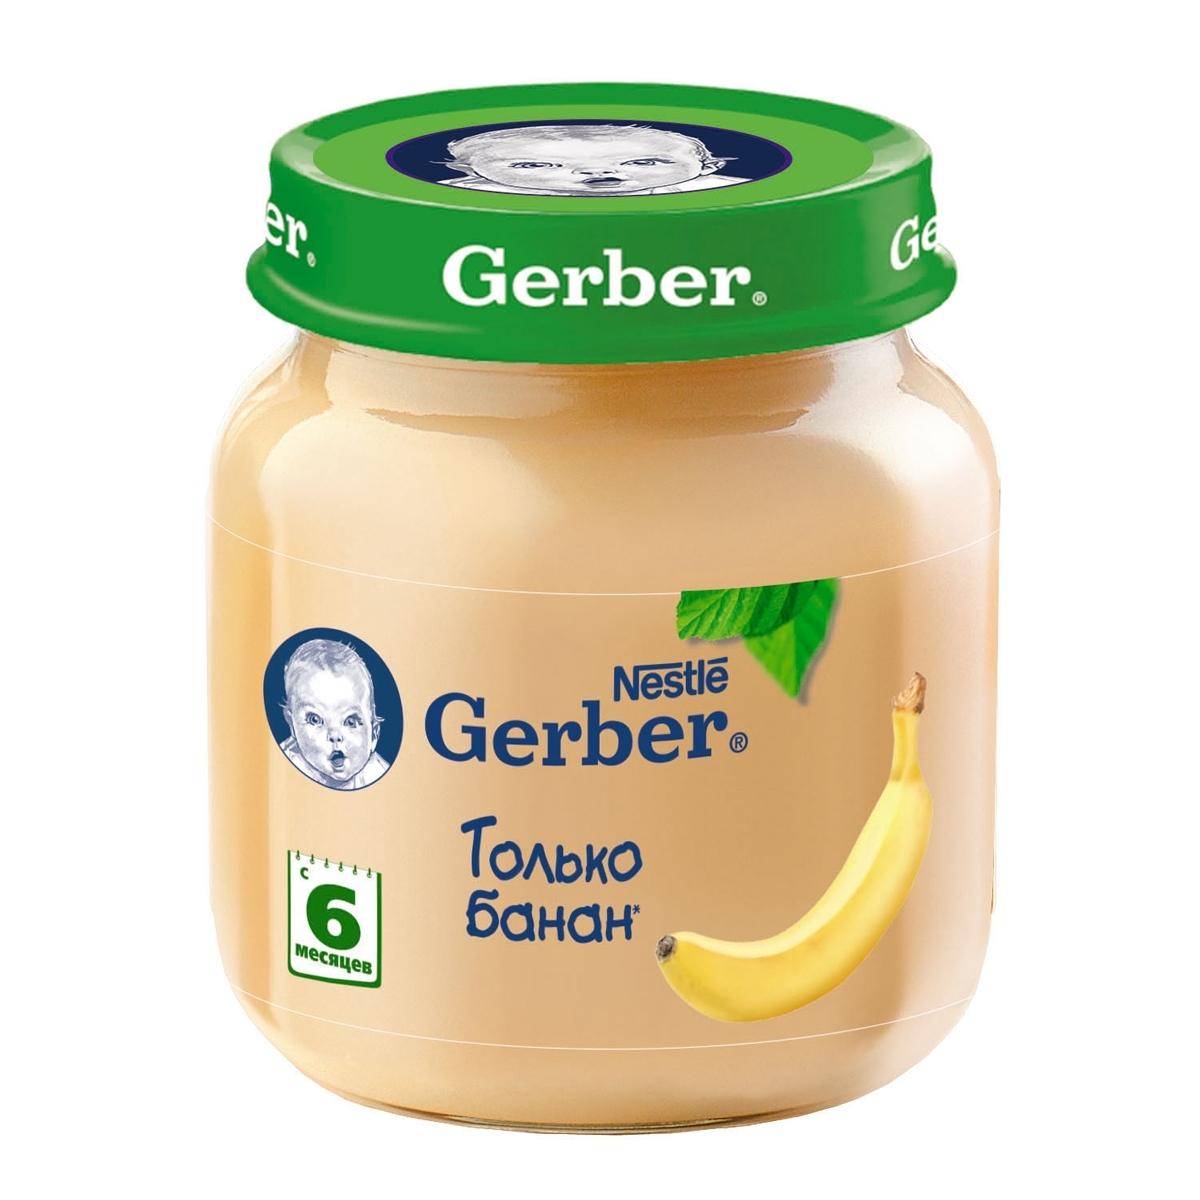 Пюре Gerber фруктовое 130 гр Банан (с 6 мес)<br>